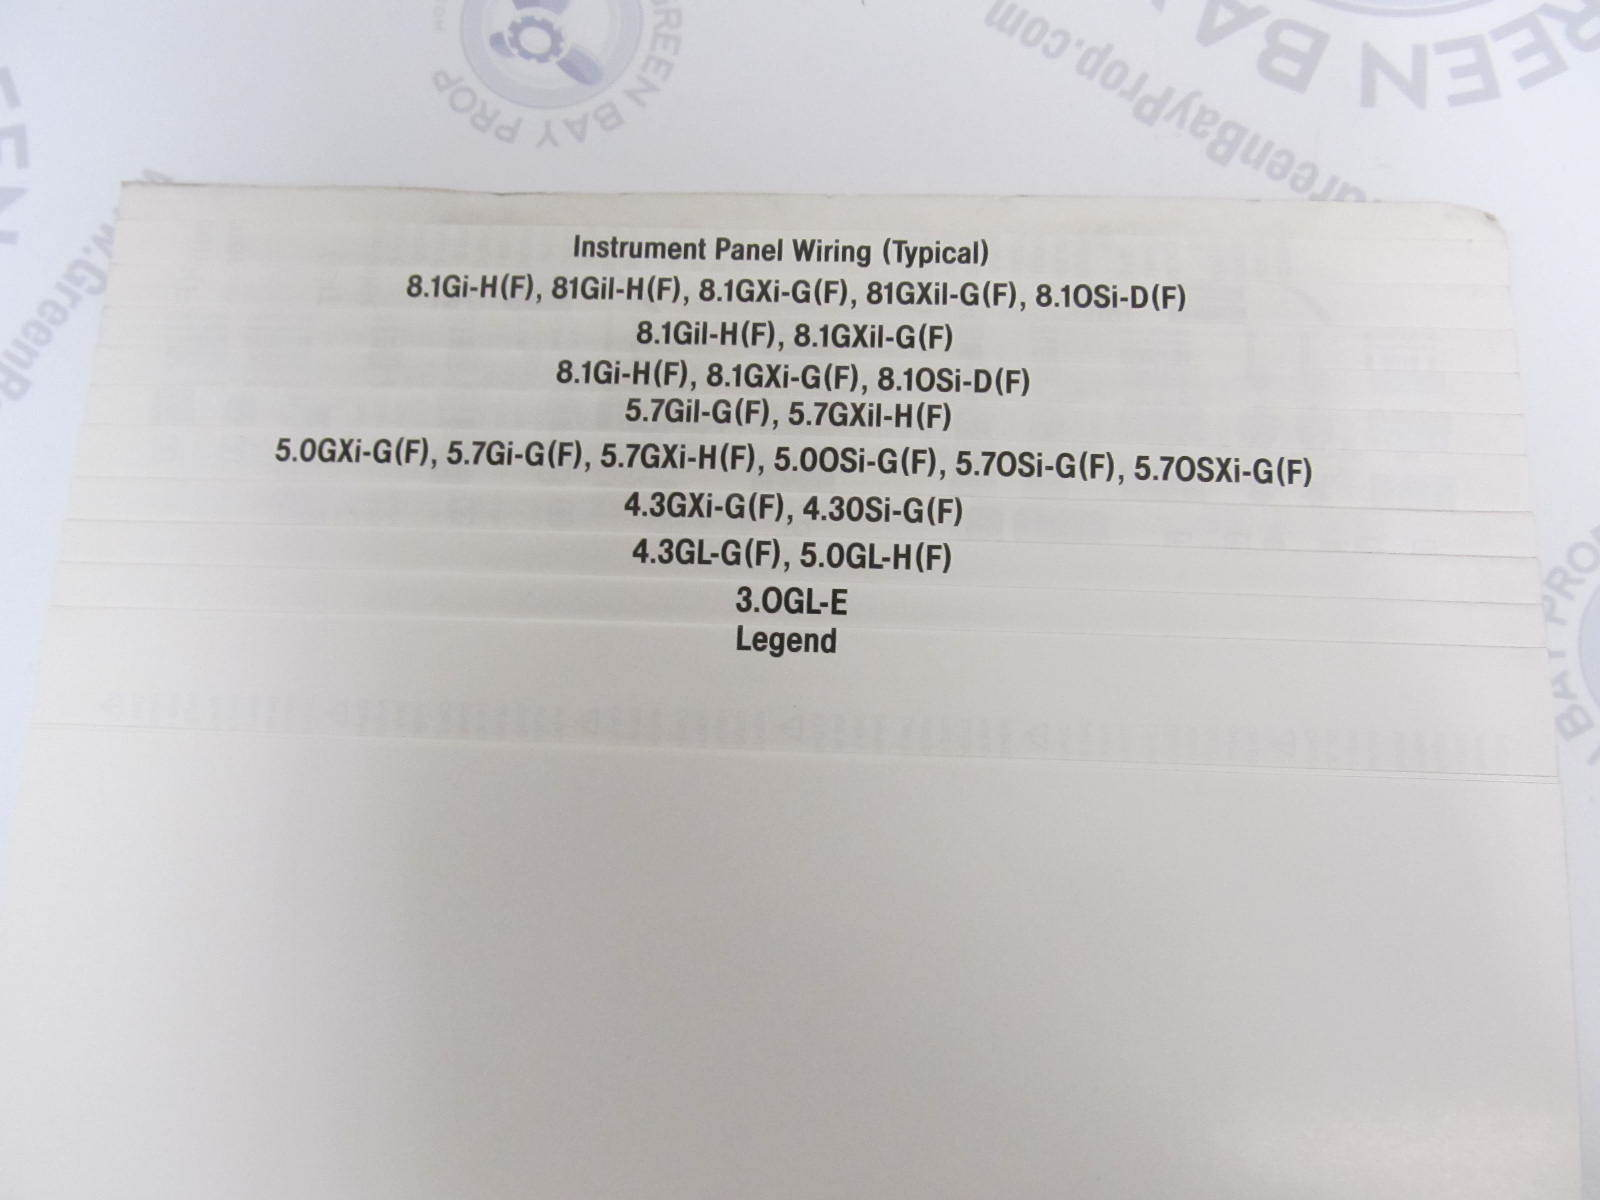 7746659 Volvo Penta Service Workshop Manual Wiring